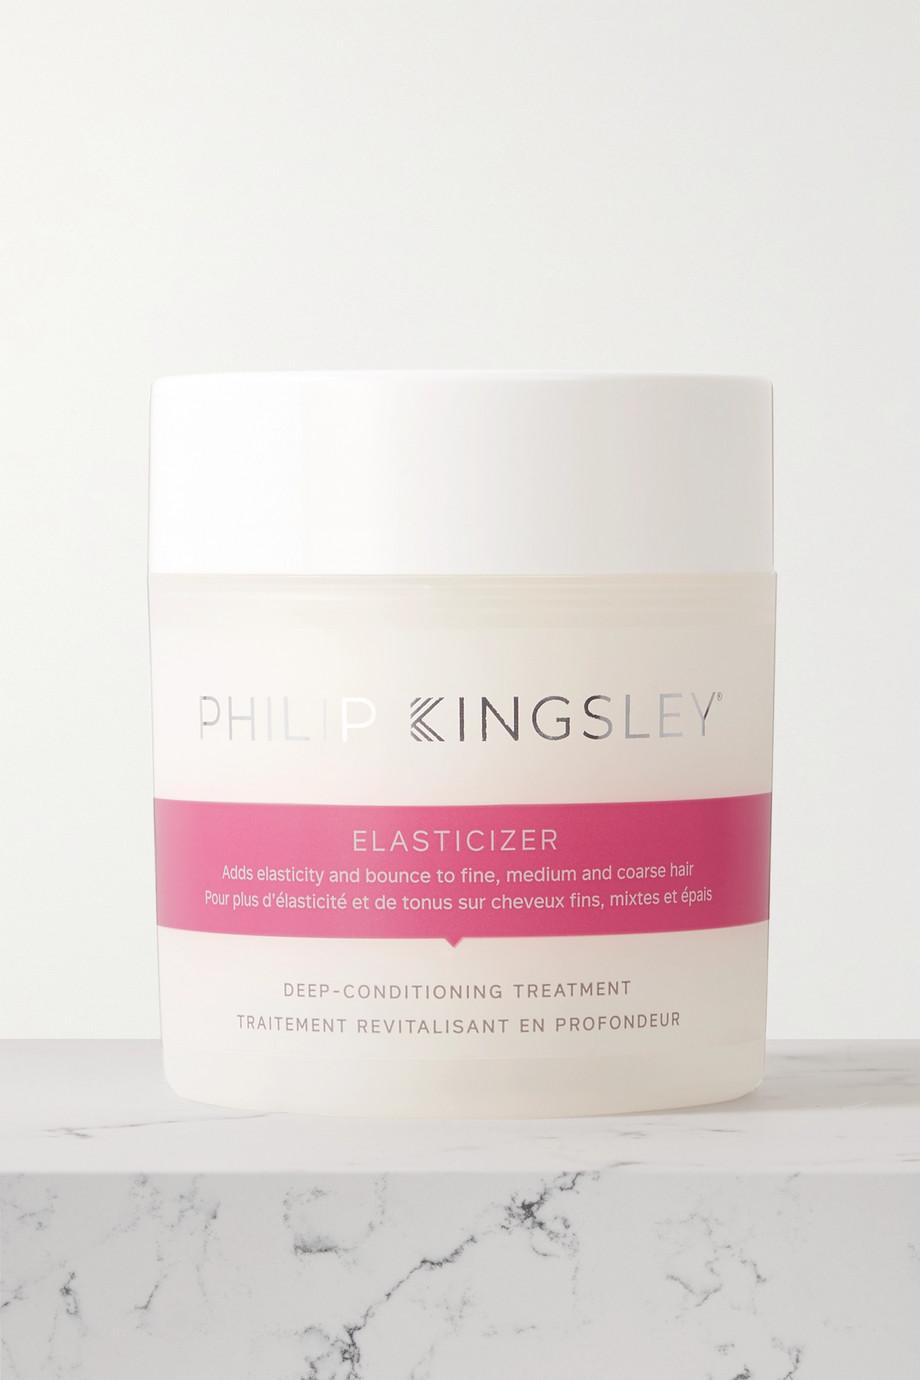 PHILIP KINGSLEY Elasticizer, 150ml